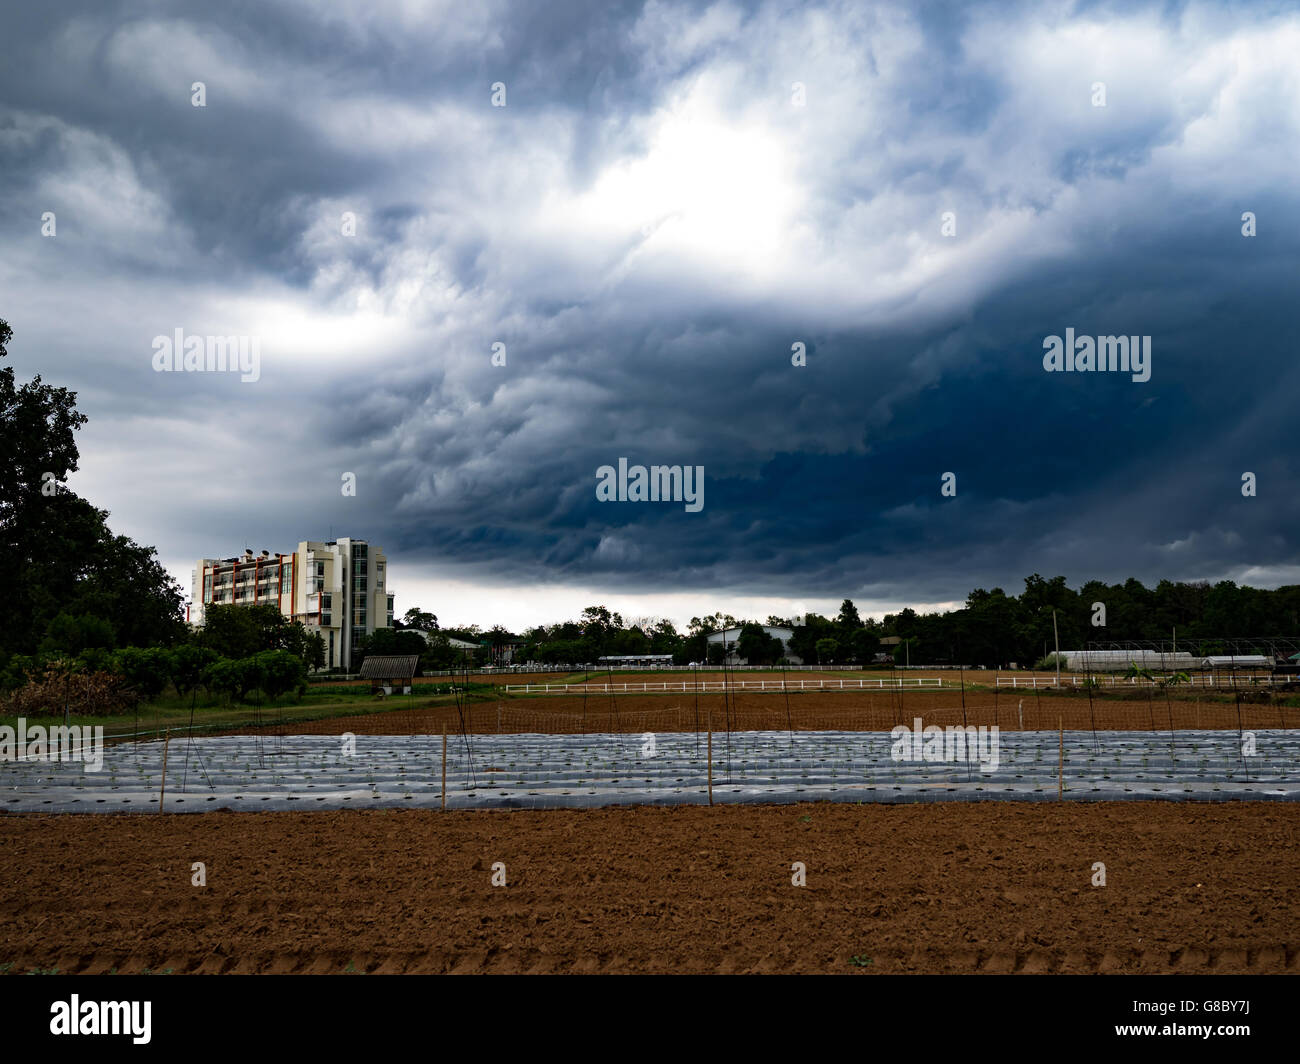 sky,hurricane,gale,tempest,rainstorm,Strom,cyclone,cloud,nimbus,cloudy - Stock Image